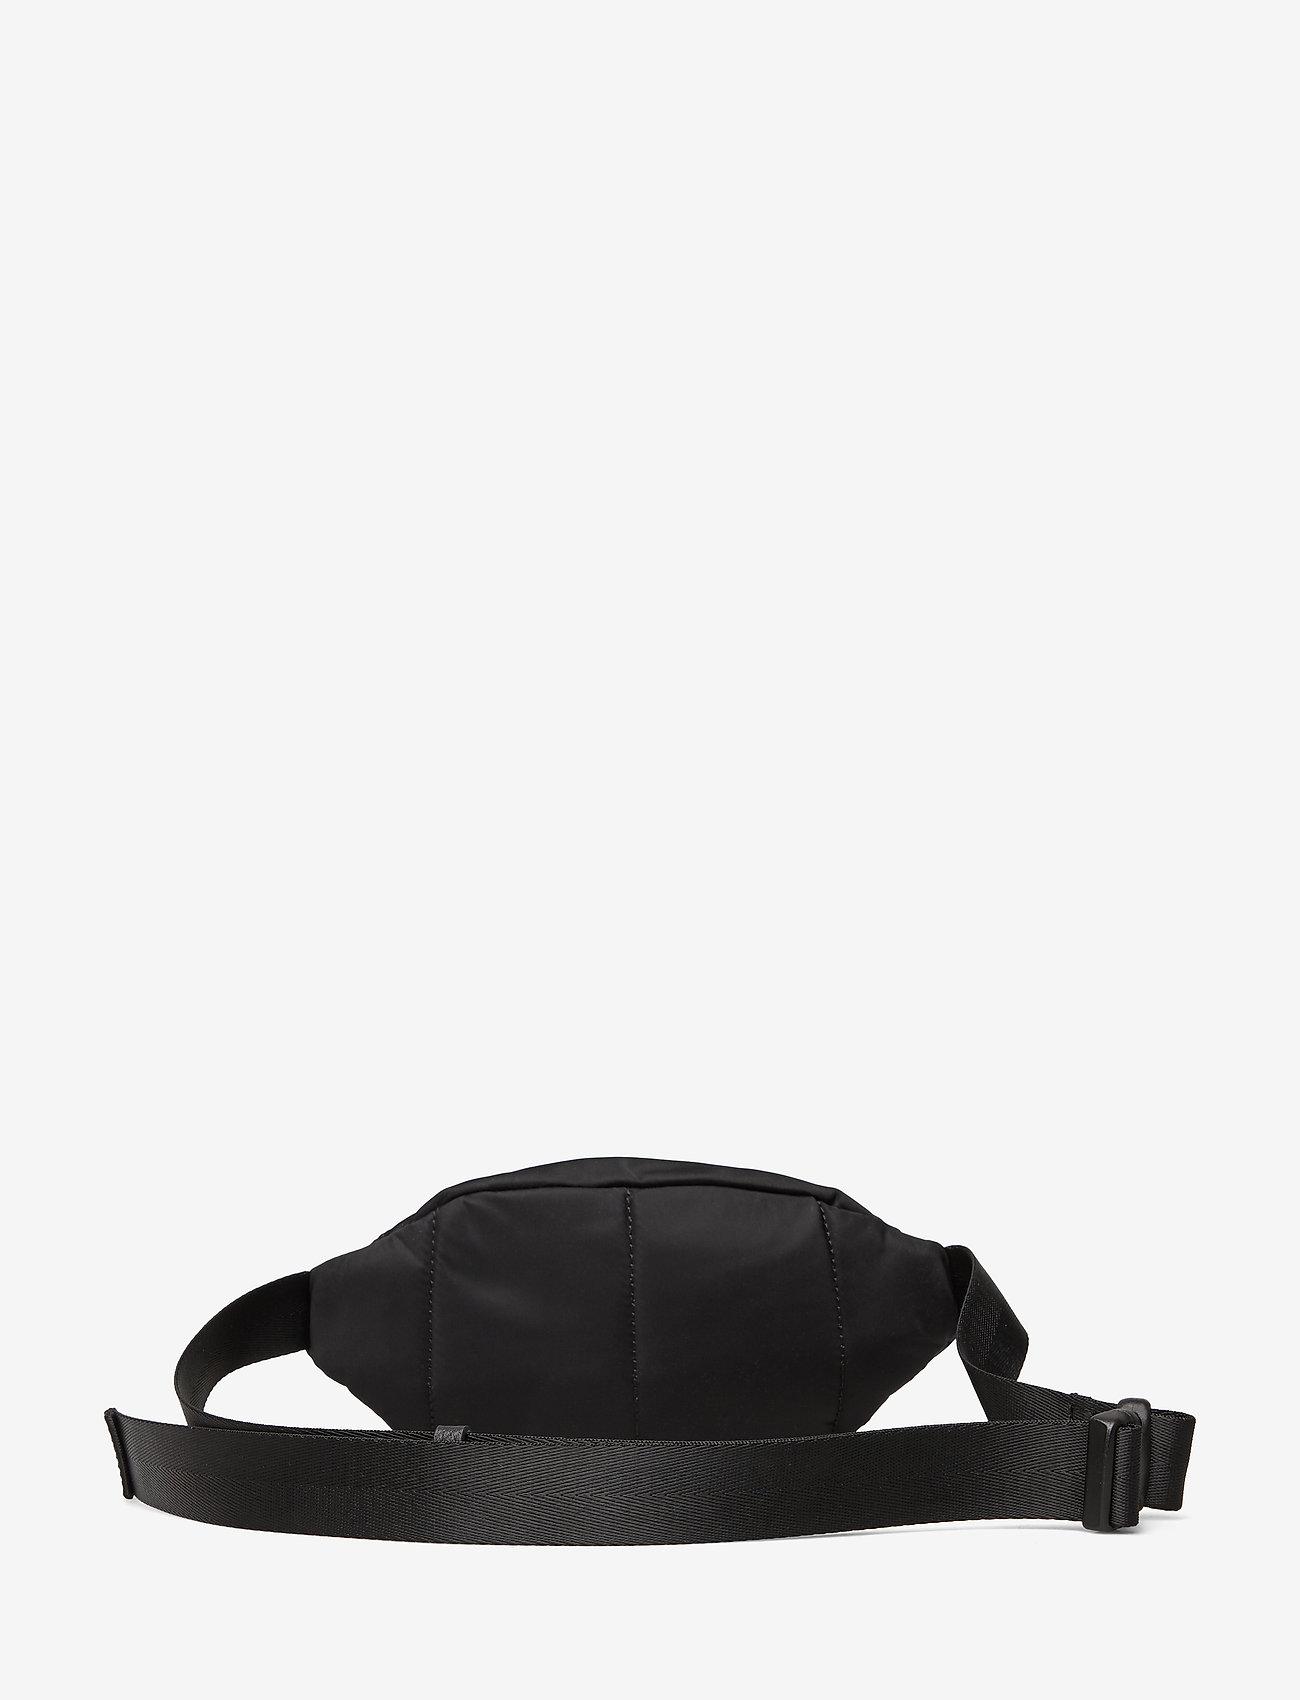 Sparrow Black Bag (Black) - HOLZWEILER 5feHMx